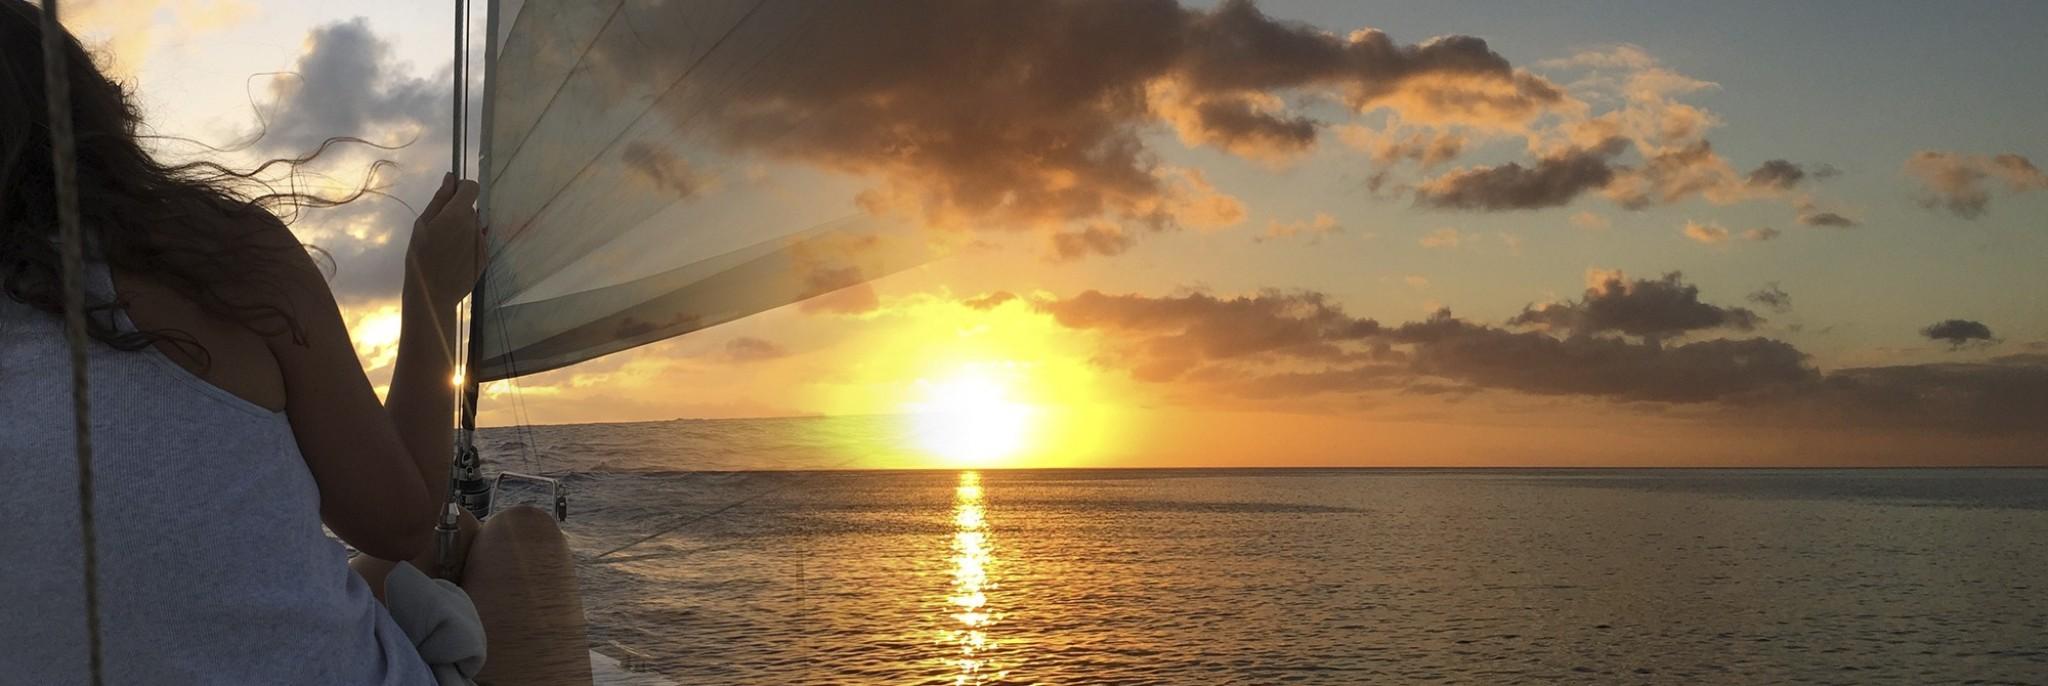 One Dubai Woman's Story About Sailing Across the Atlantic